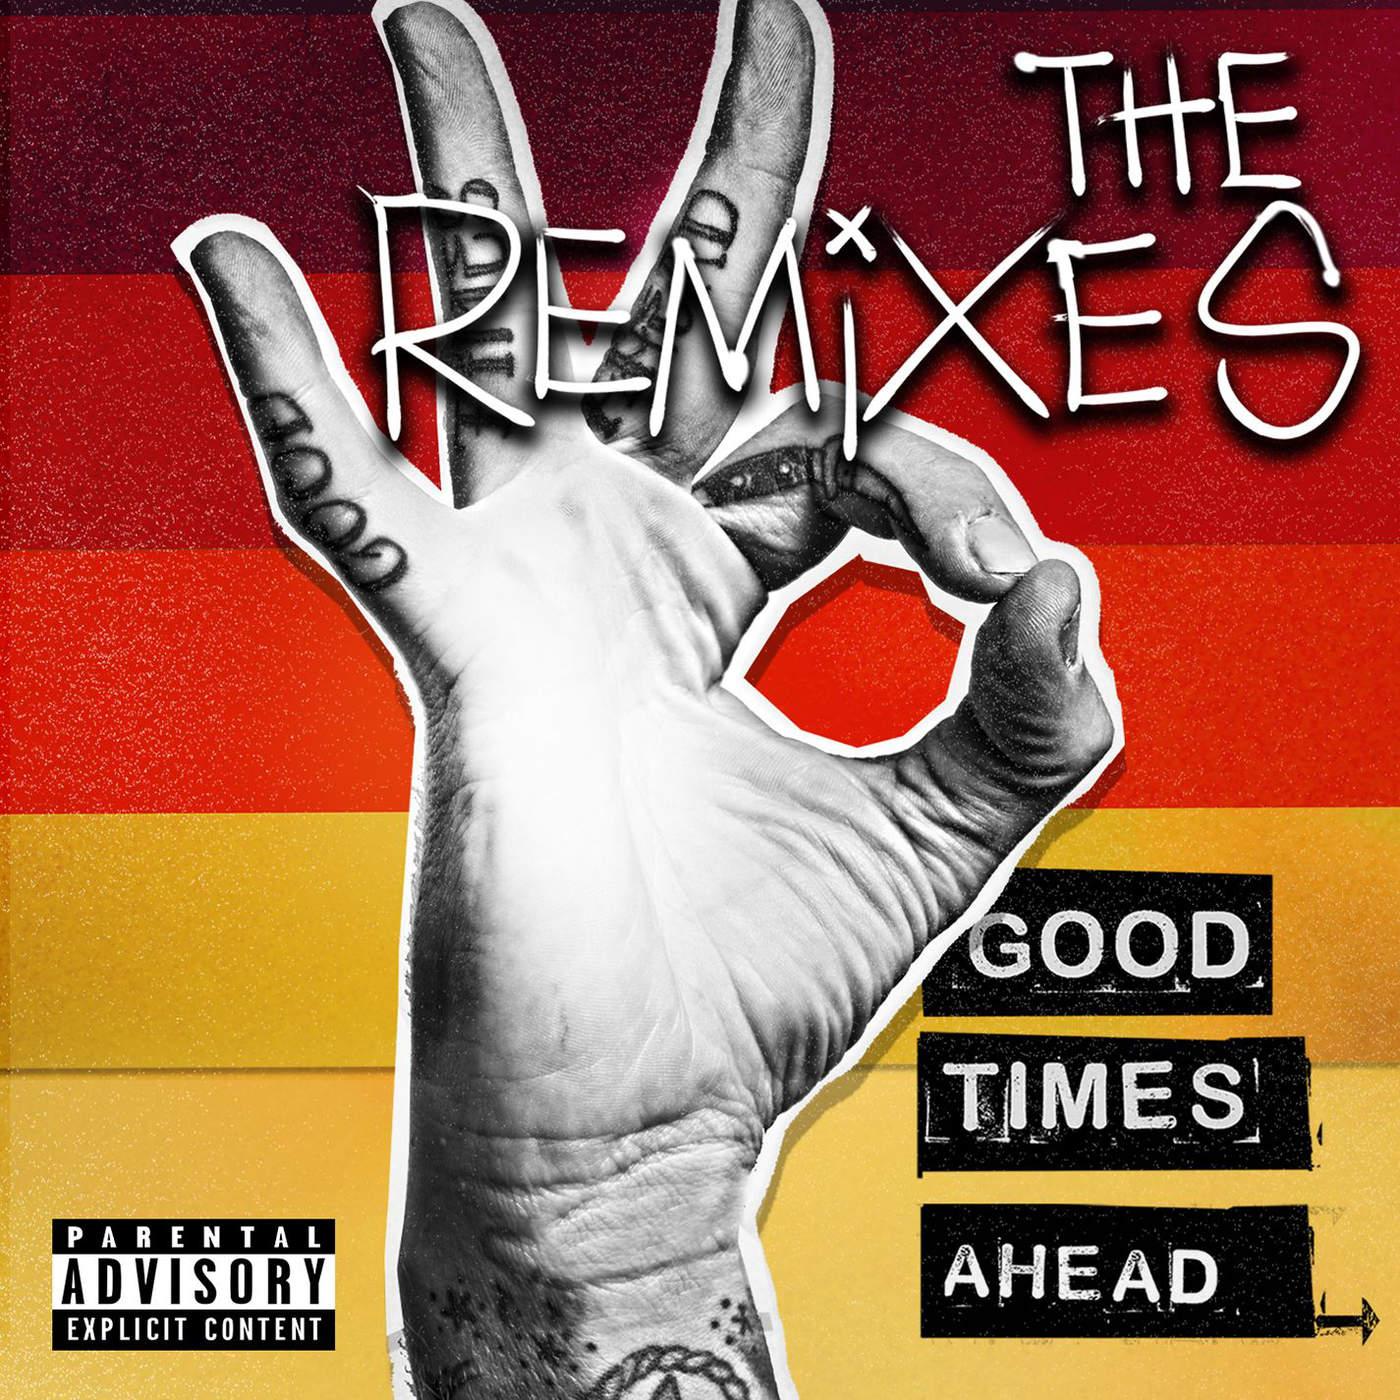 GTA - Good Times Ahead: The Remixes Cover